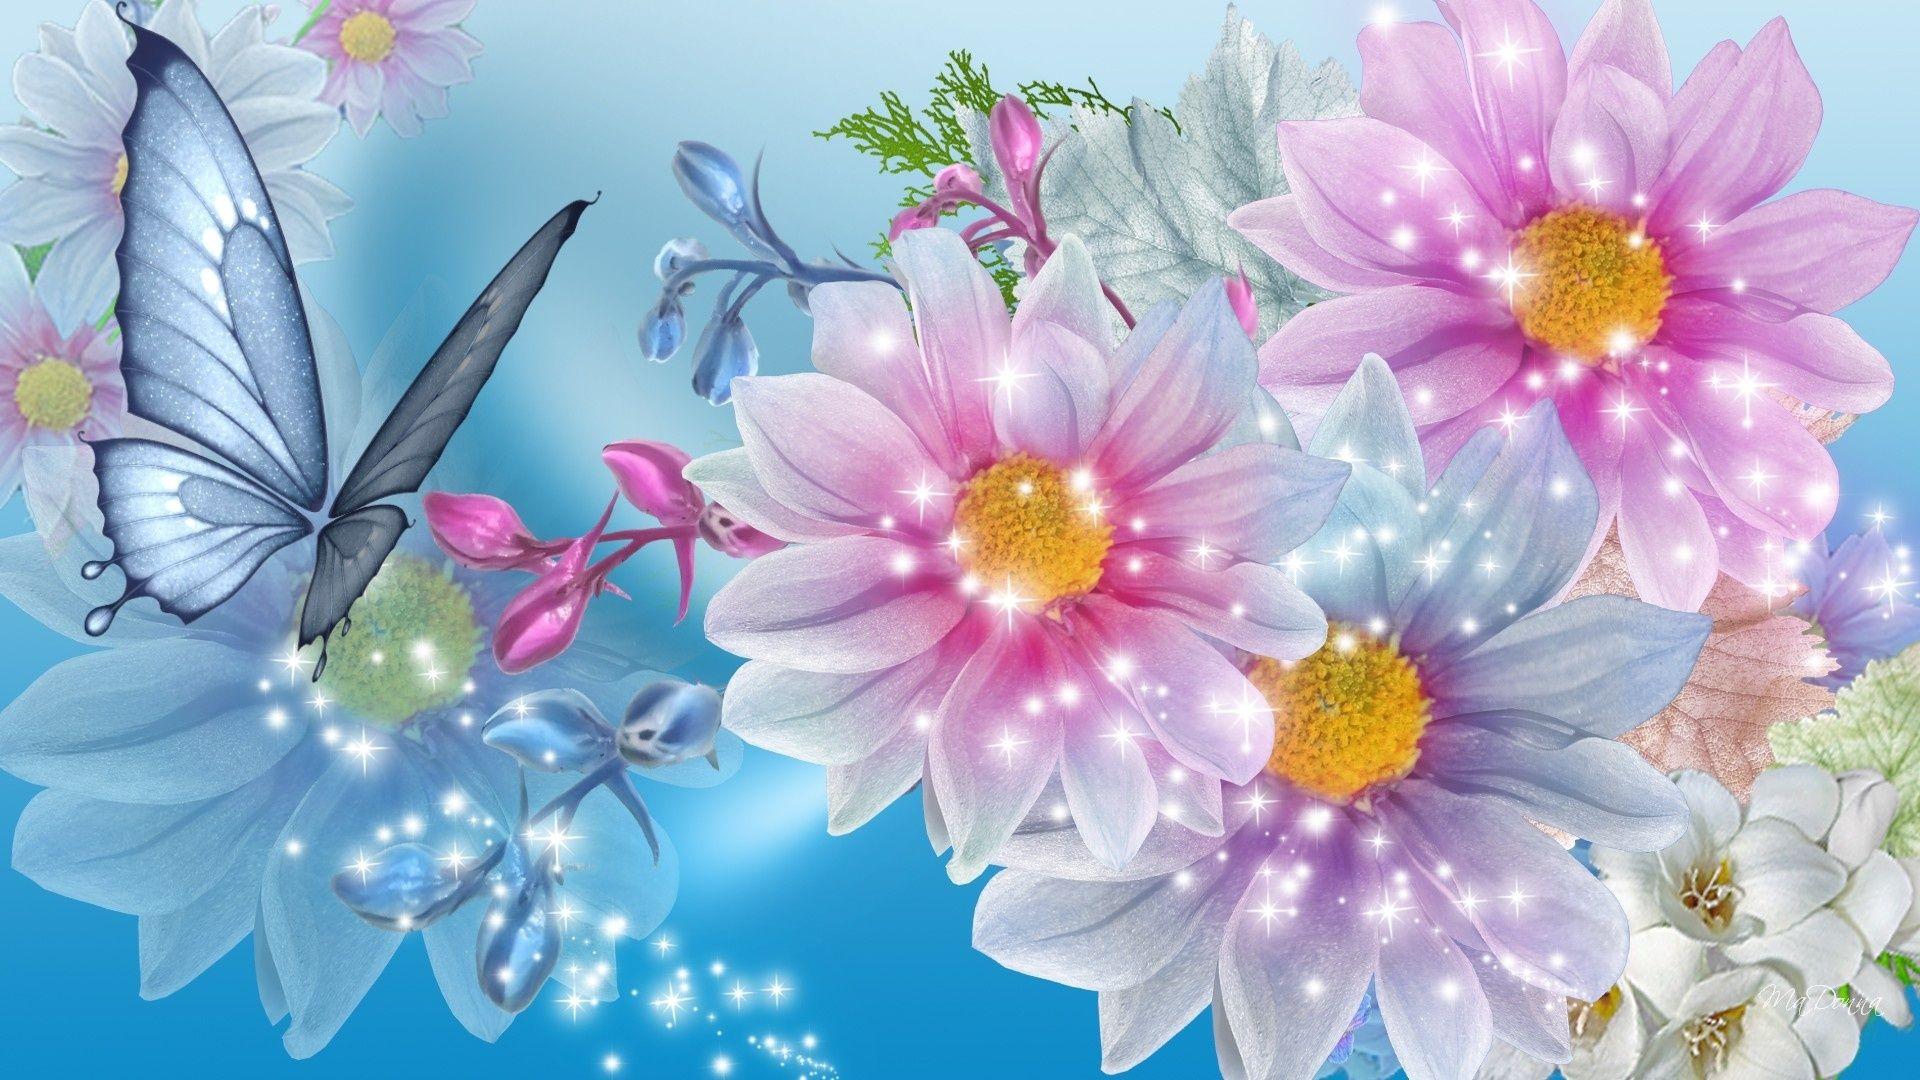 Beautiful Flower Wallpaper For Girls Desktop Wallpaper | flowers & butterflies in 2019 ...